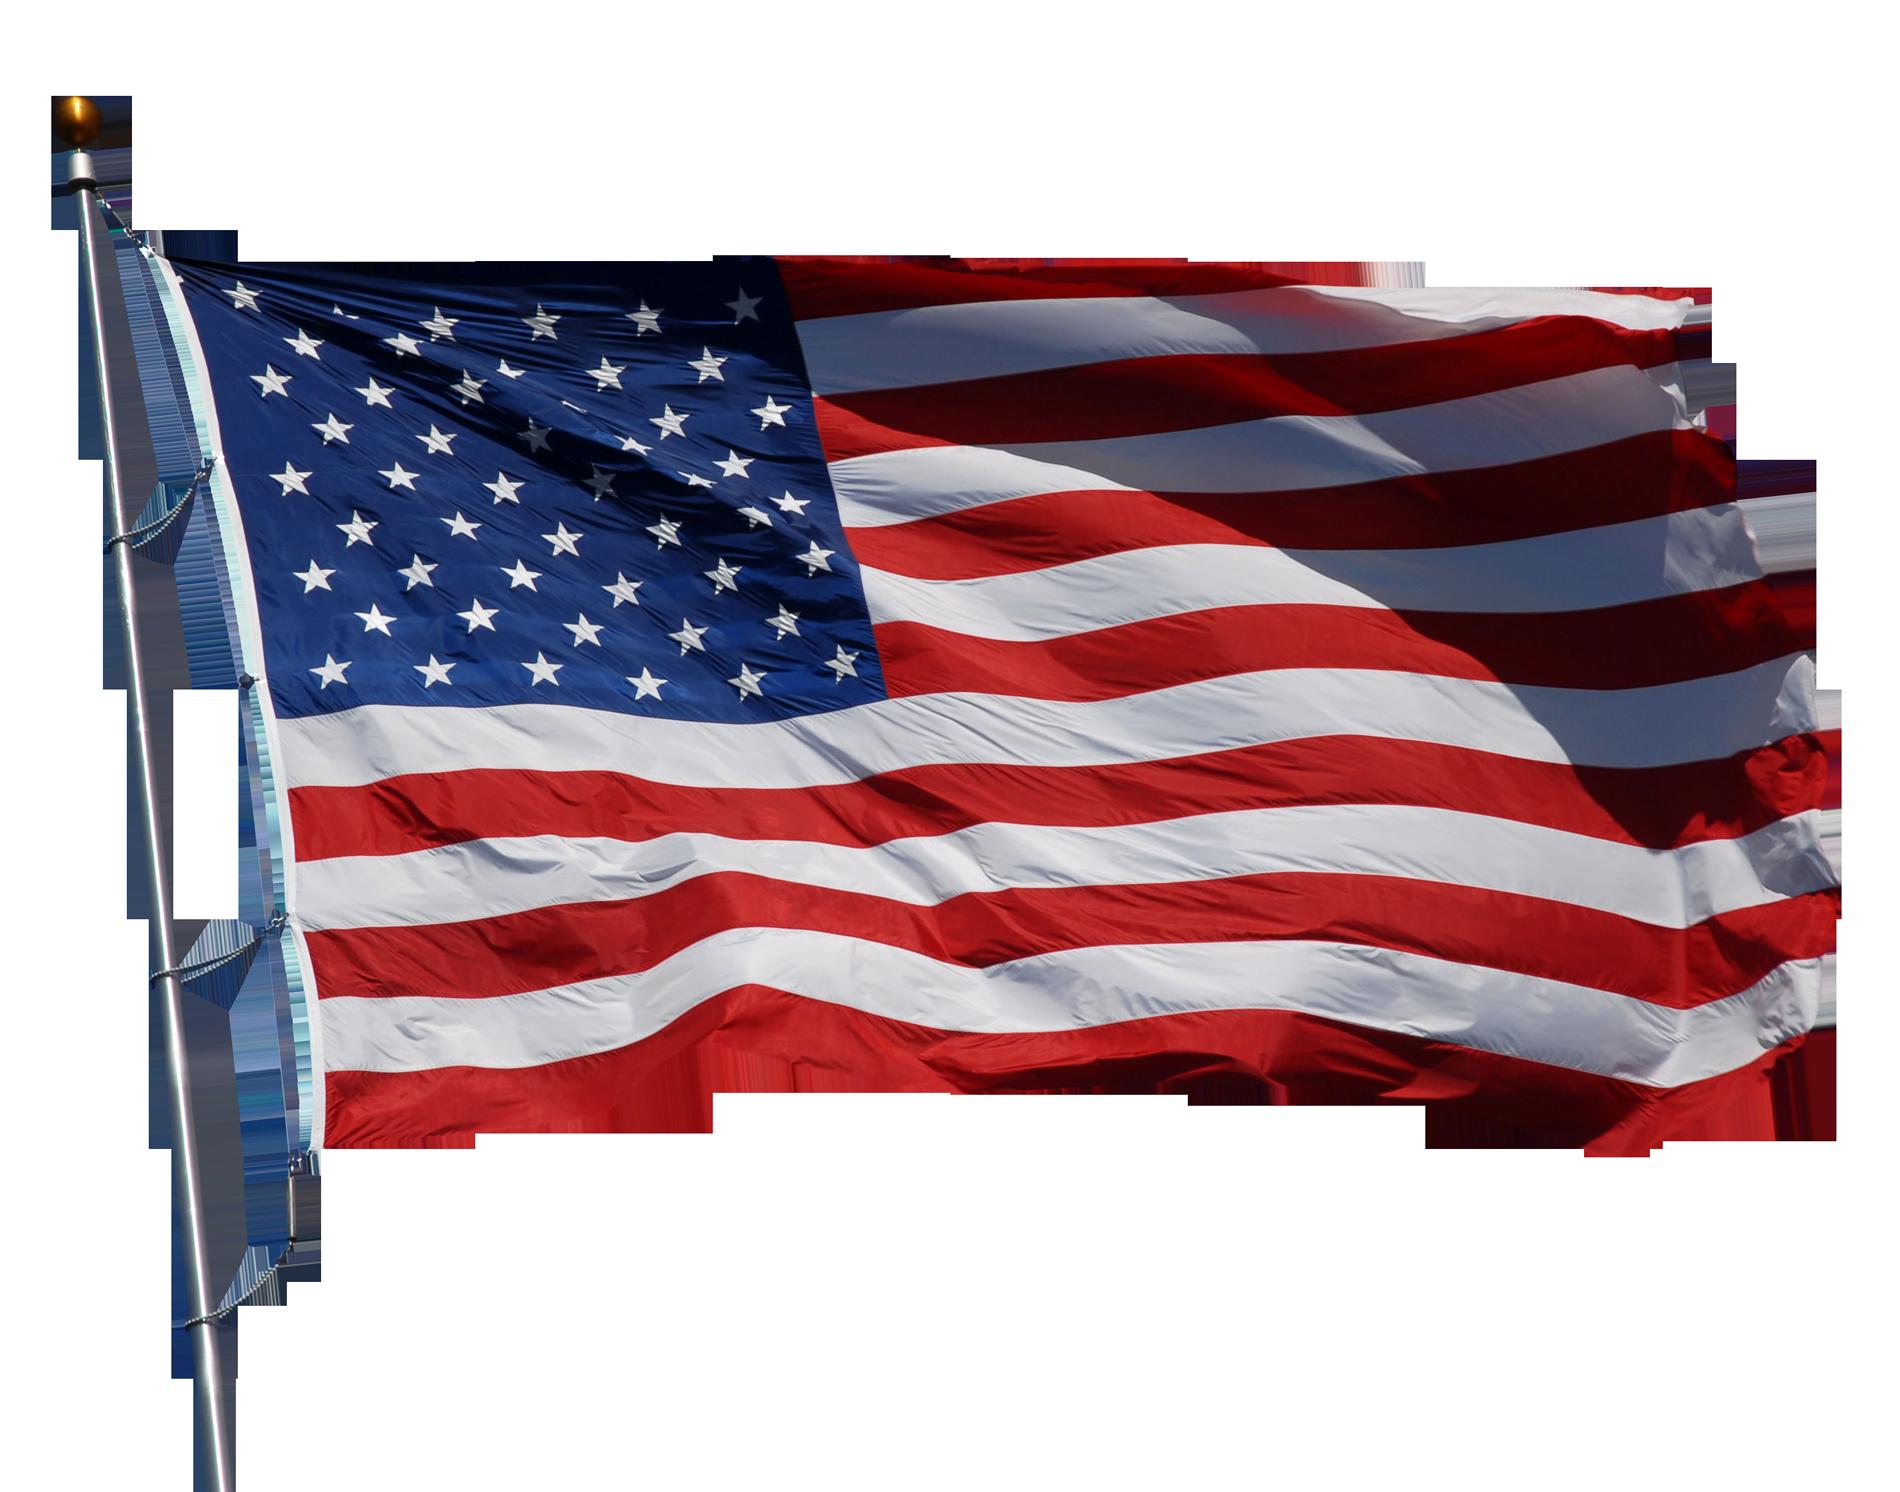 purepng.com-america-flagobjectsamerica-flagflag-object-usa-nation-america-631522325862b1sjx.png